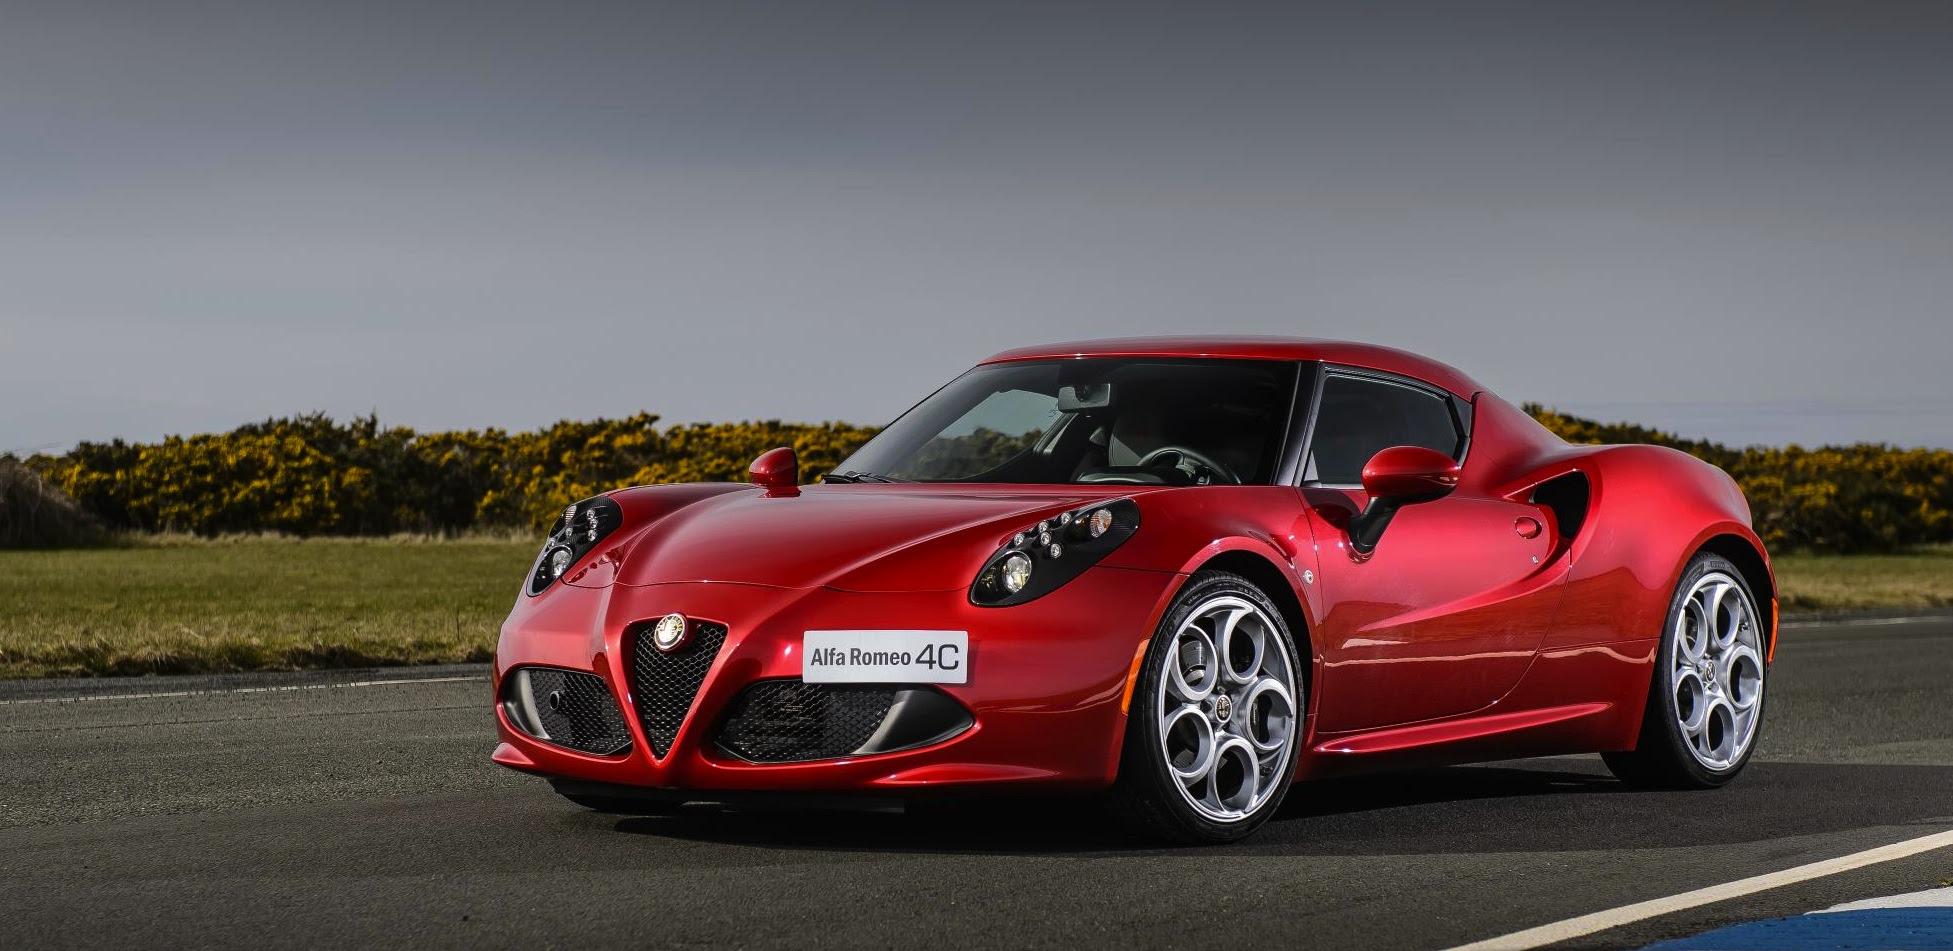 Good News: Alfa Romeo's Future Will Be A Festival Of 4WD & RWD